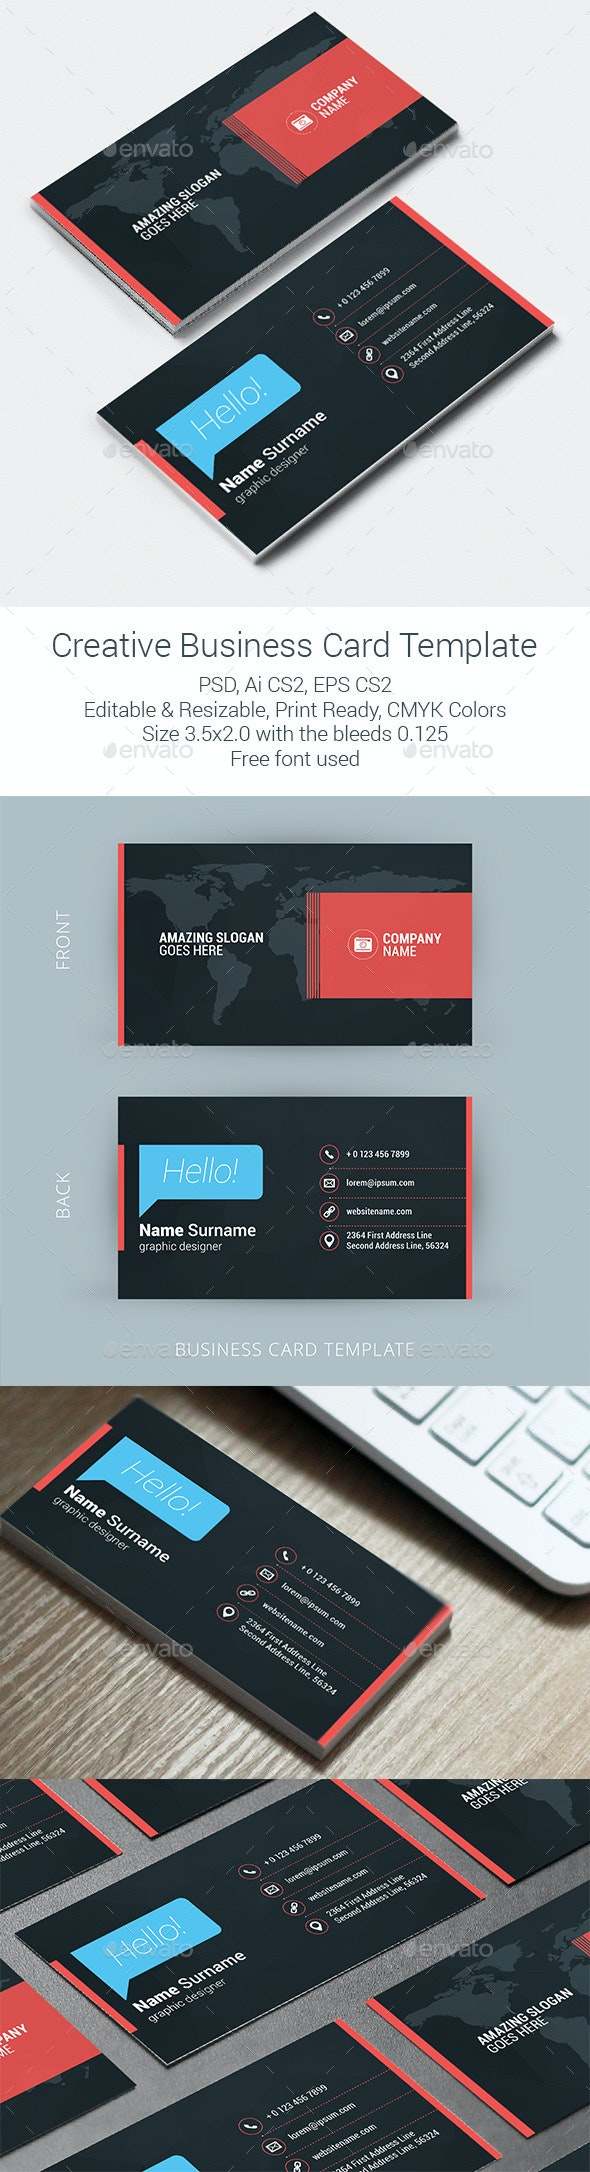 Creative Business Card Template - Creative Business Cards